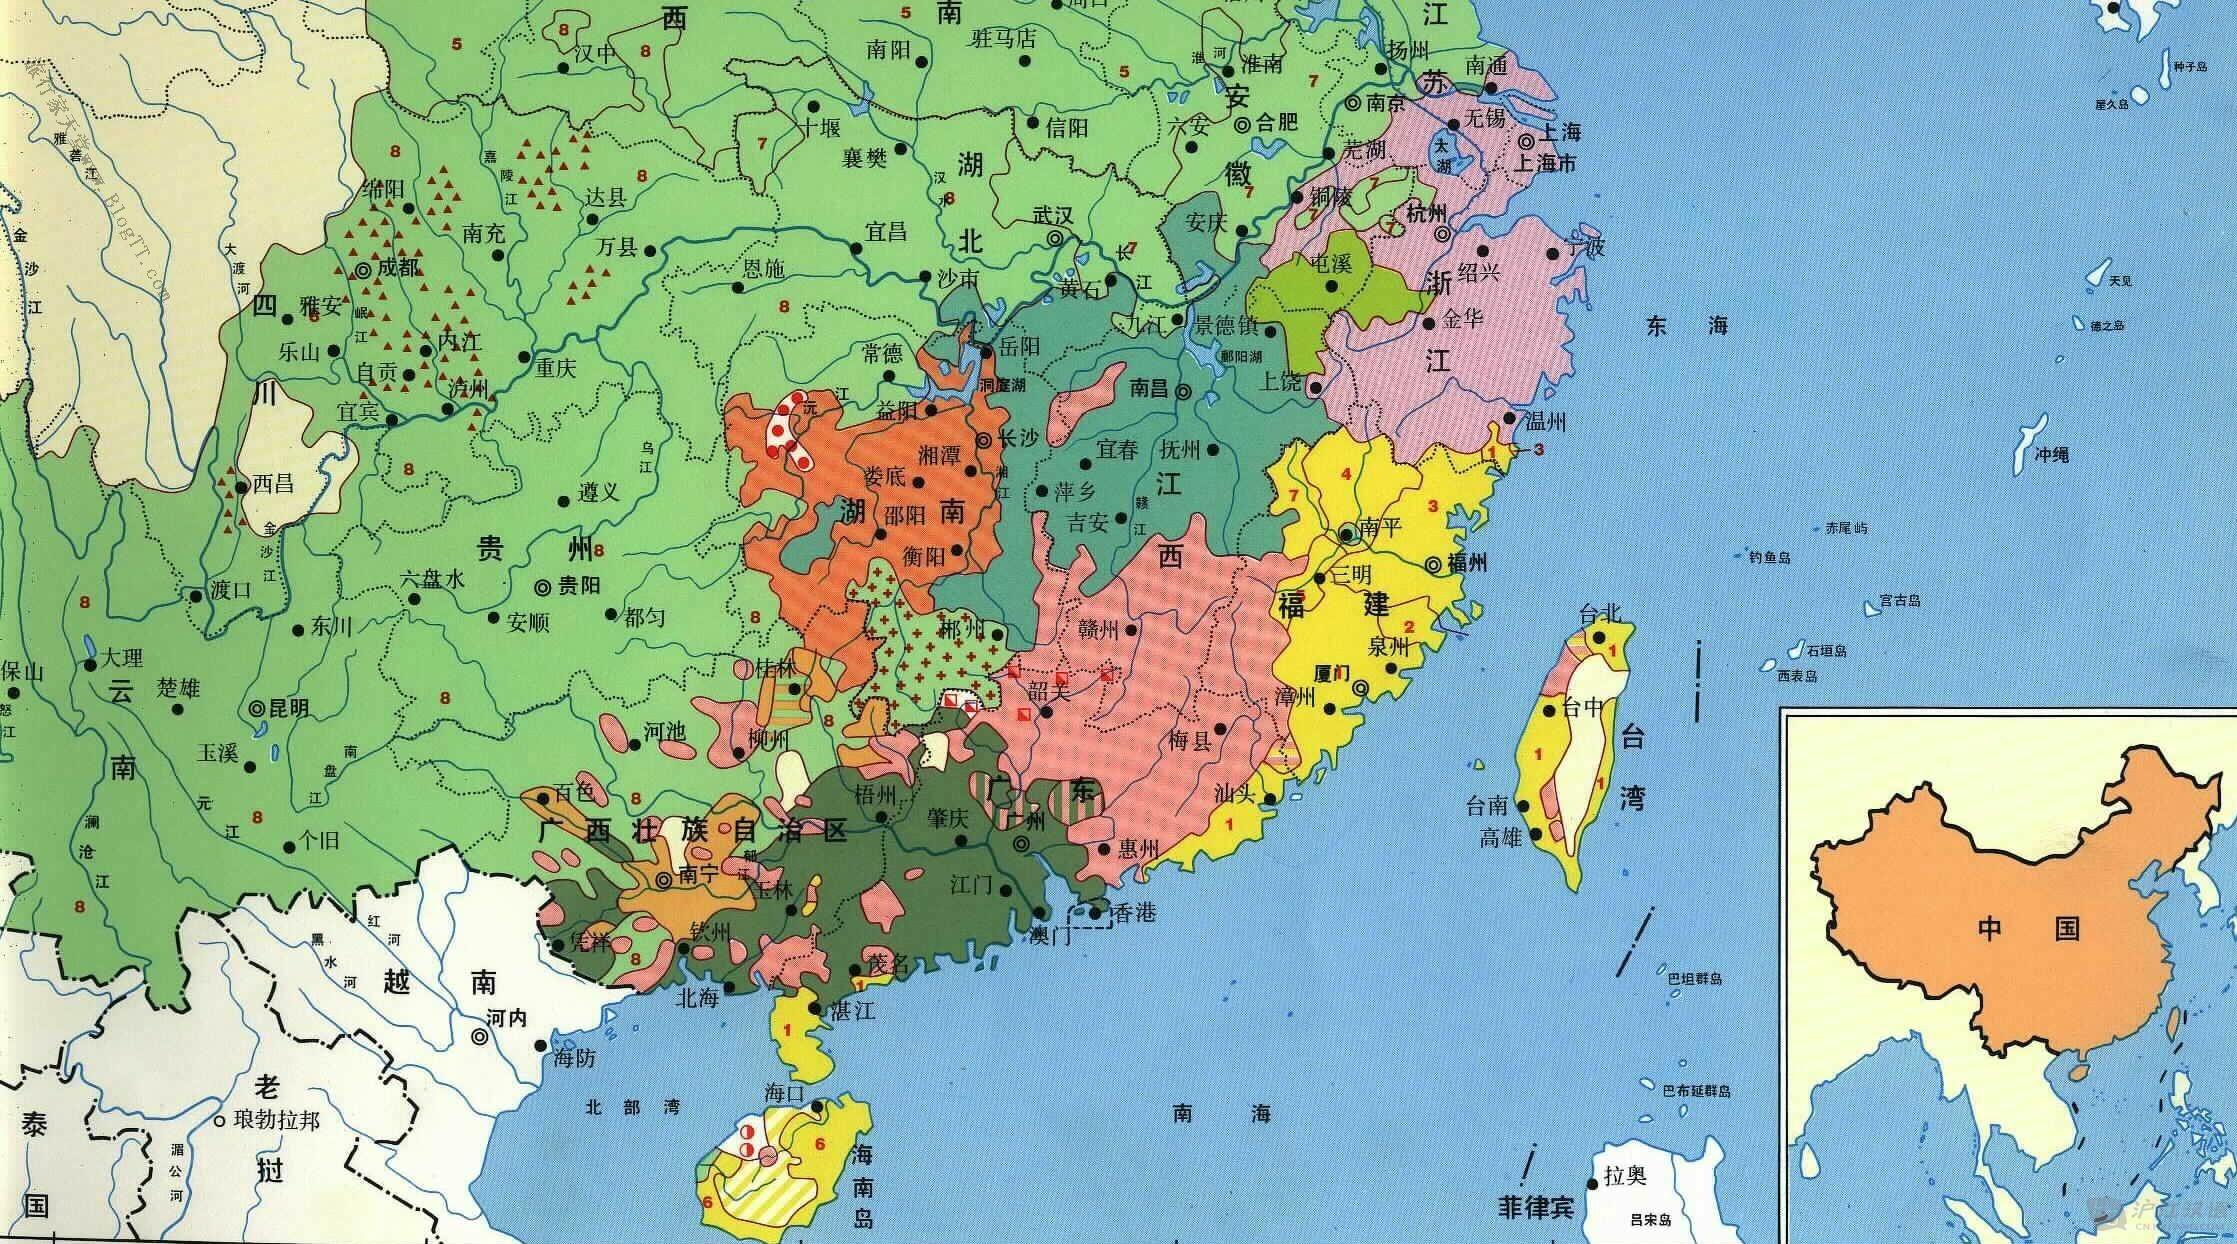 segment of Chinese dialects 中国方言分部